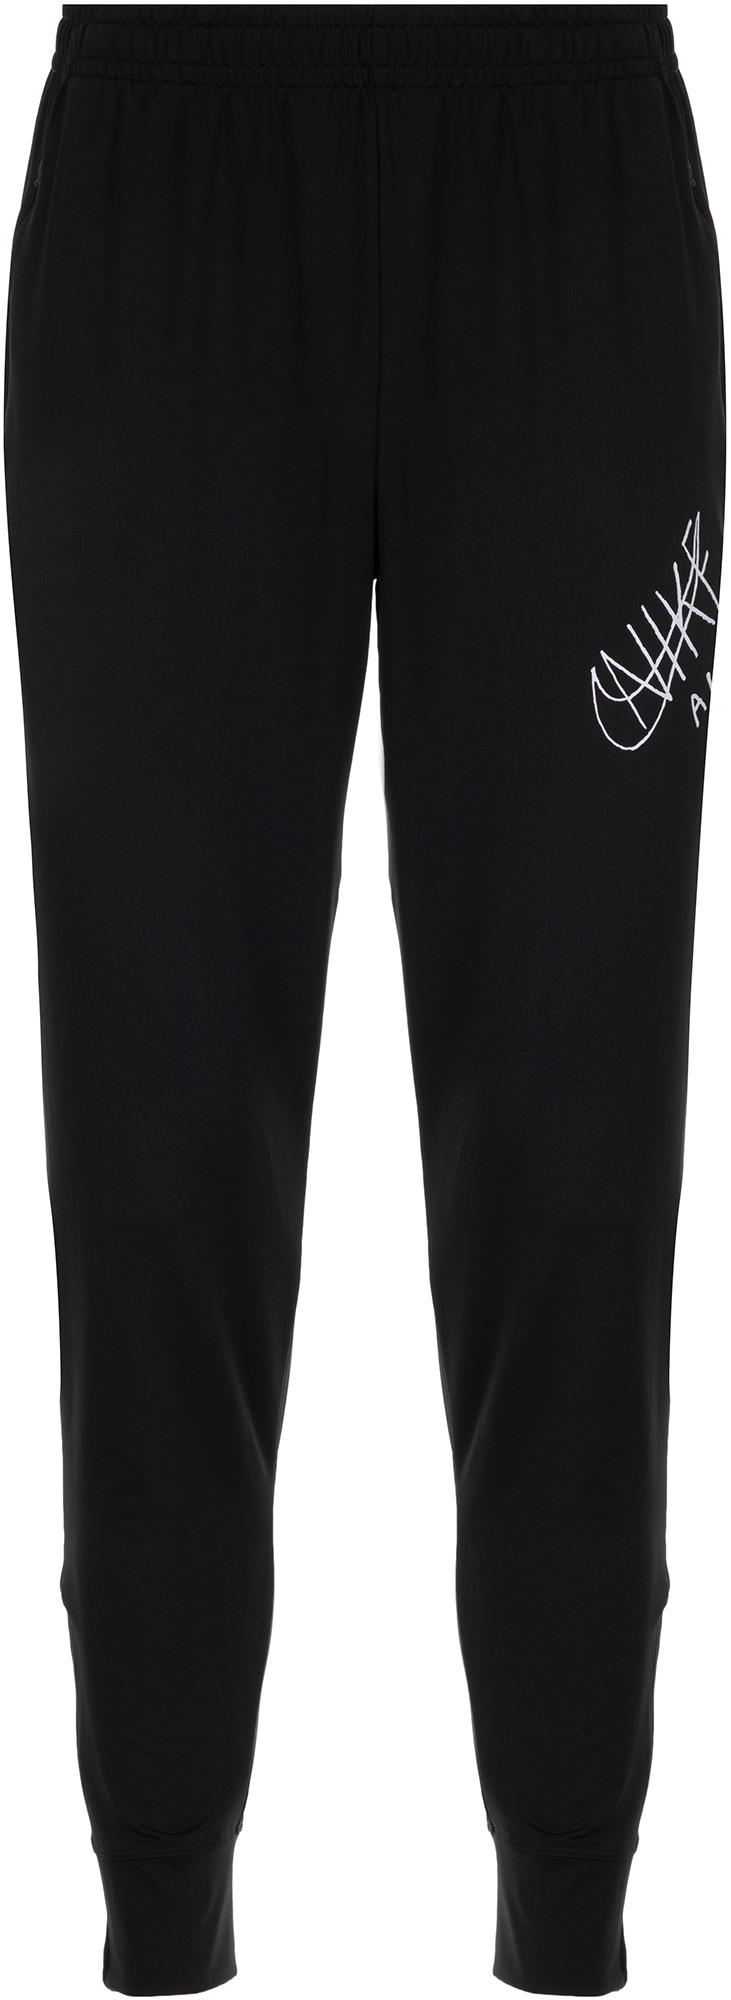 Nike Брюки мужские Nike Essential Knit, размер 52-54